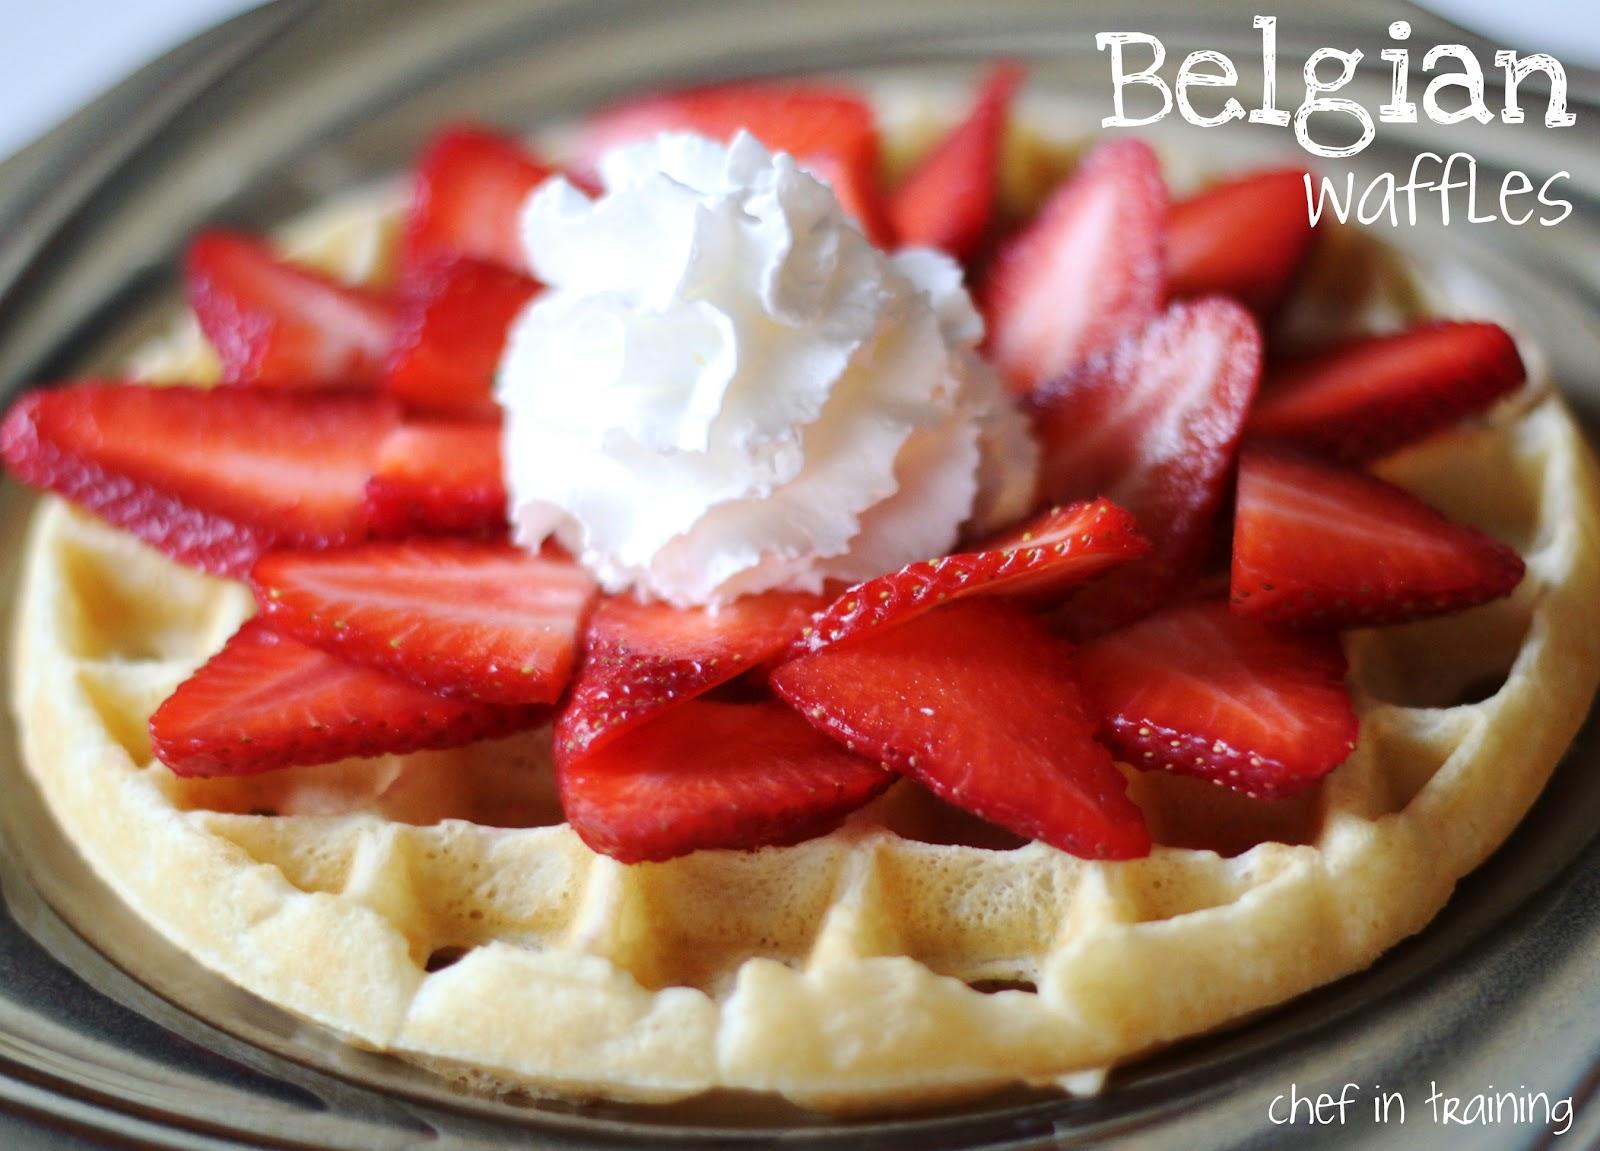 Belgian waffles chef in training belgian waffles forumfinder Images